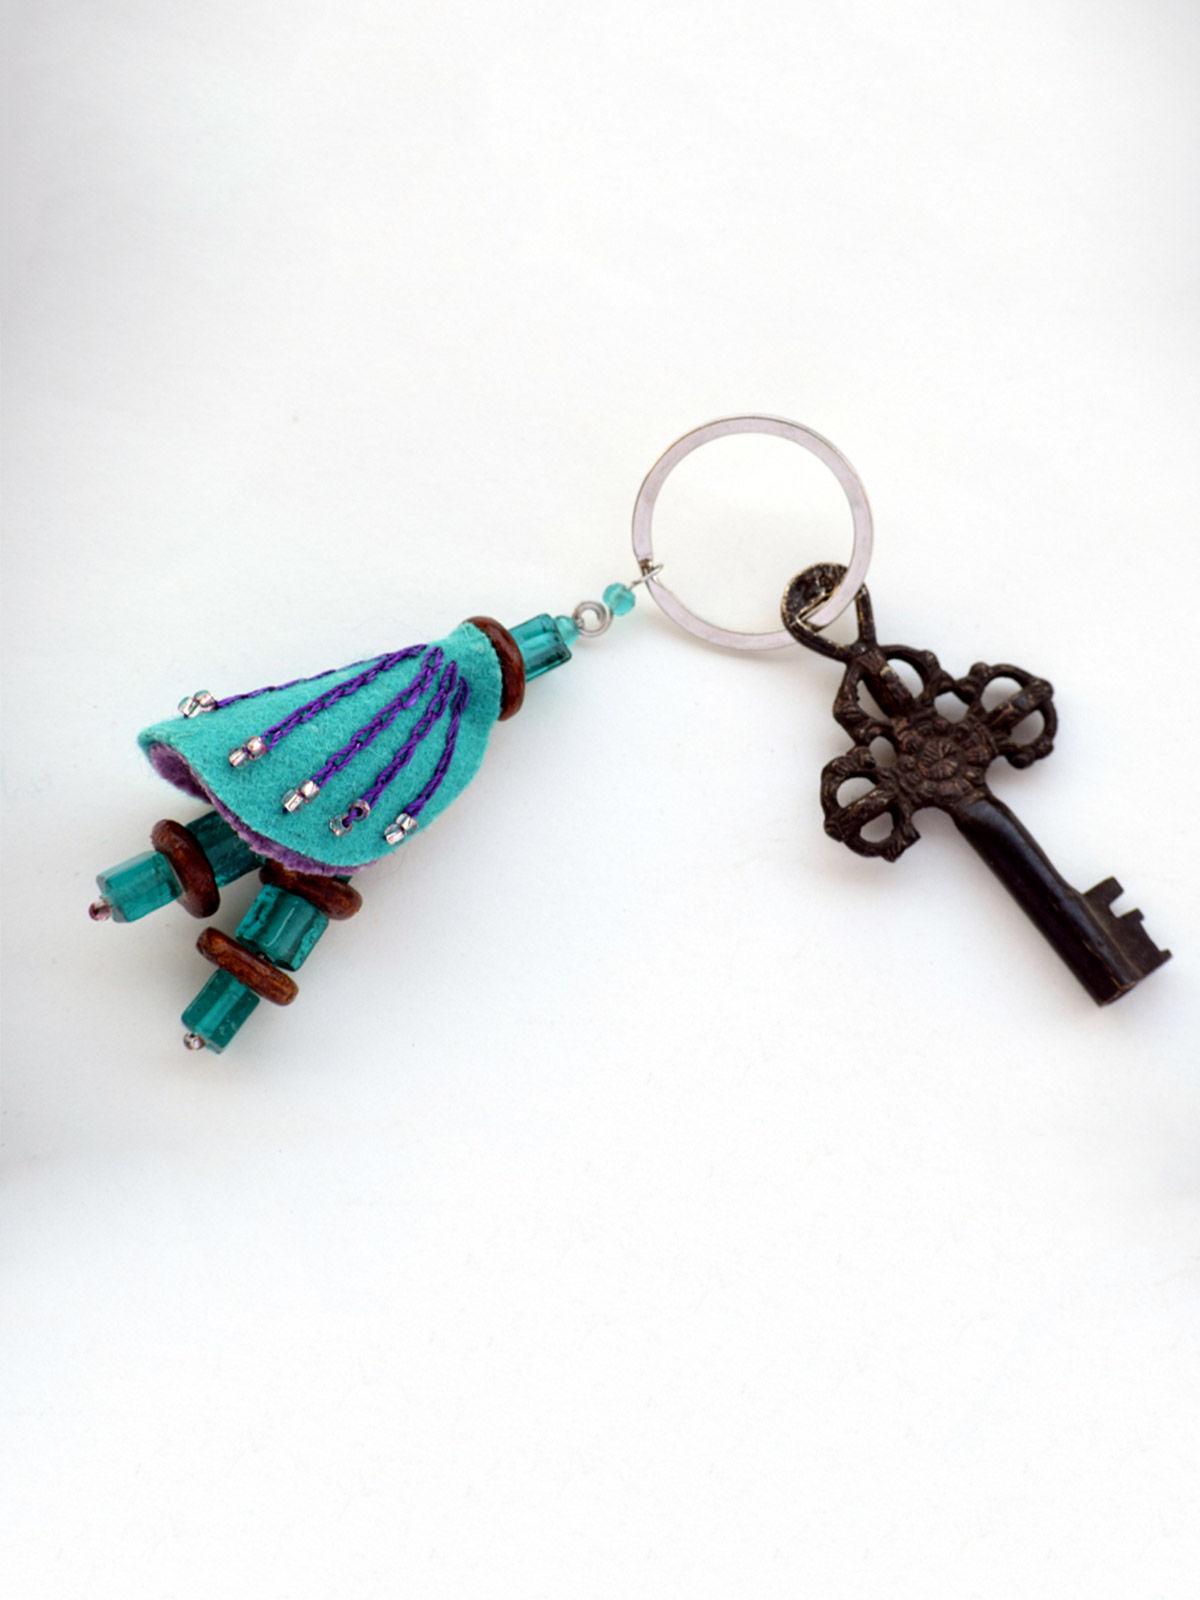 Chrysalis Keychain - Teal